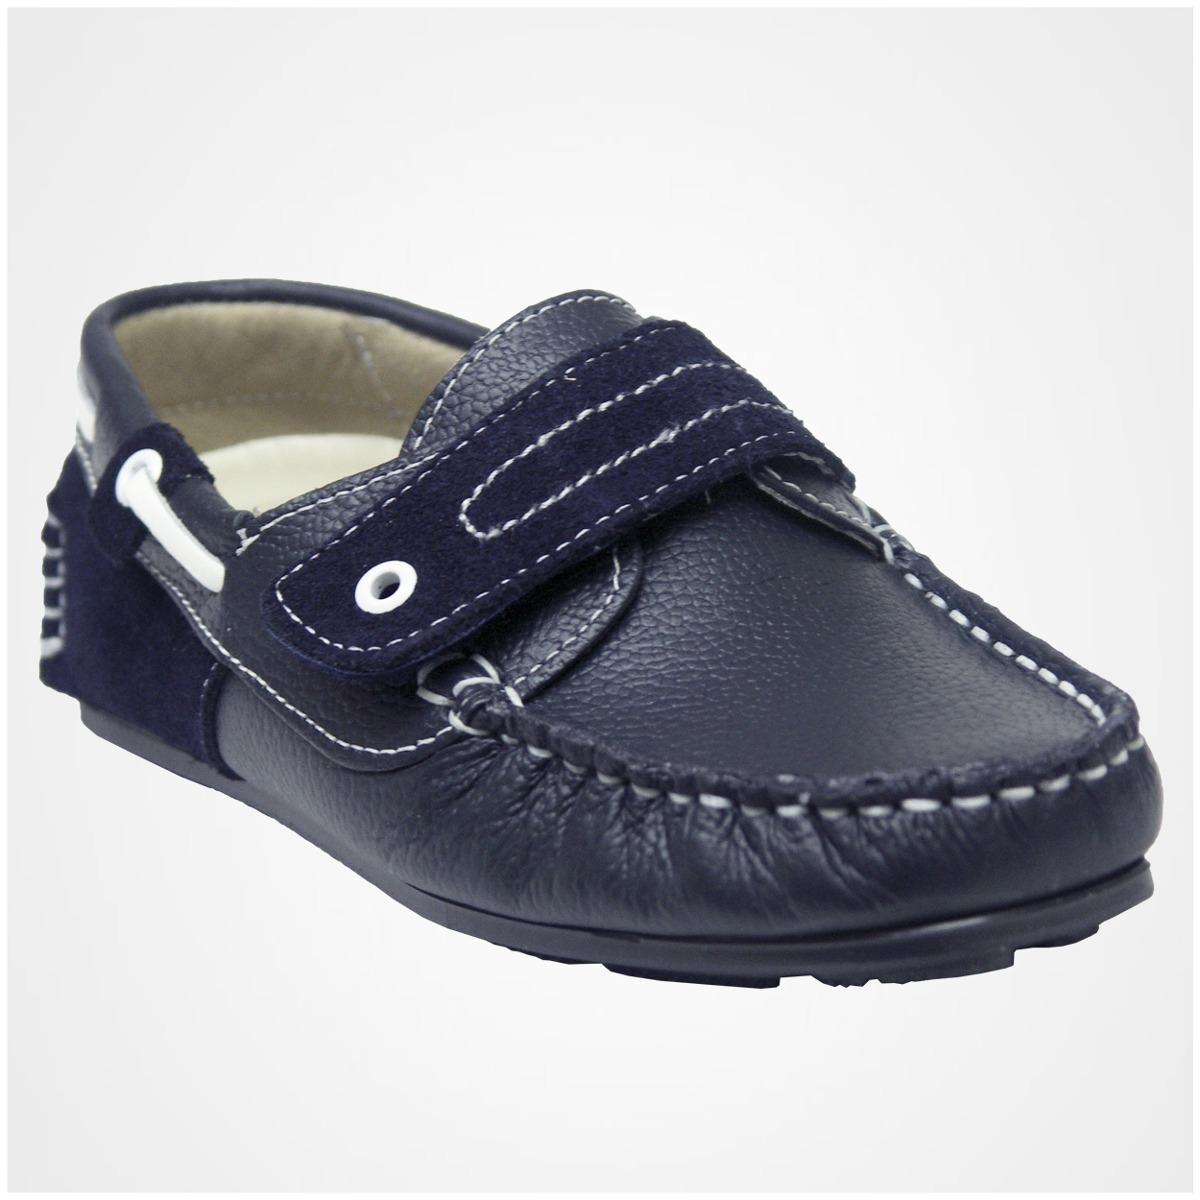 6e82b00e9 zapato mocasines niño mini burbujas piel azul marino 58600. Cargando zoom.